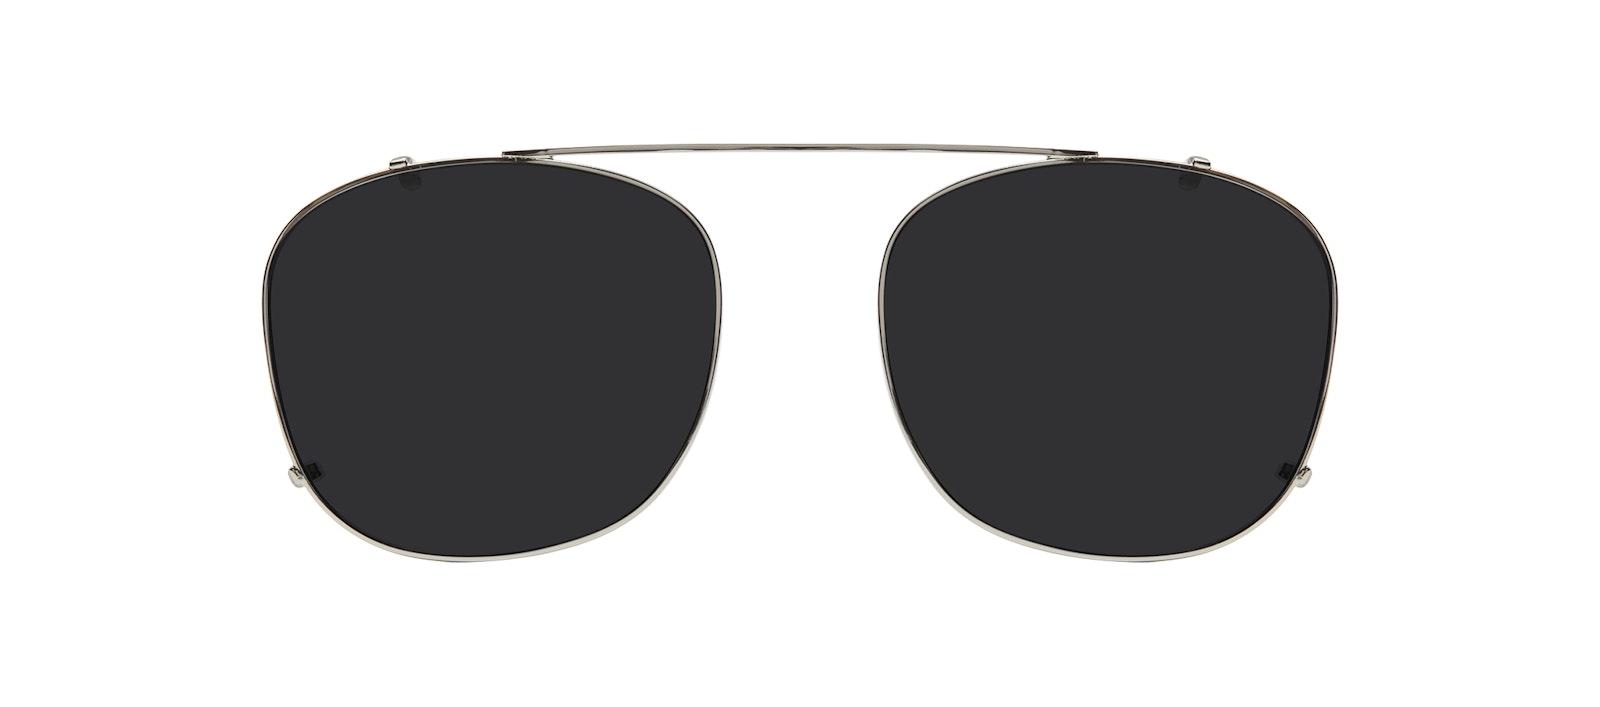 Affordable Fashion Glasses Accessory Men Apex Clip S Silver Front